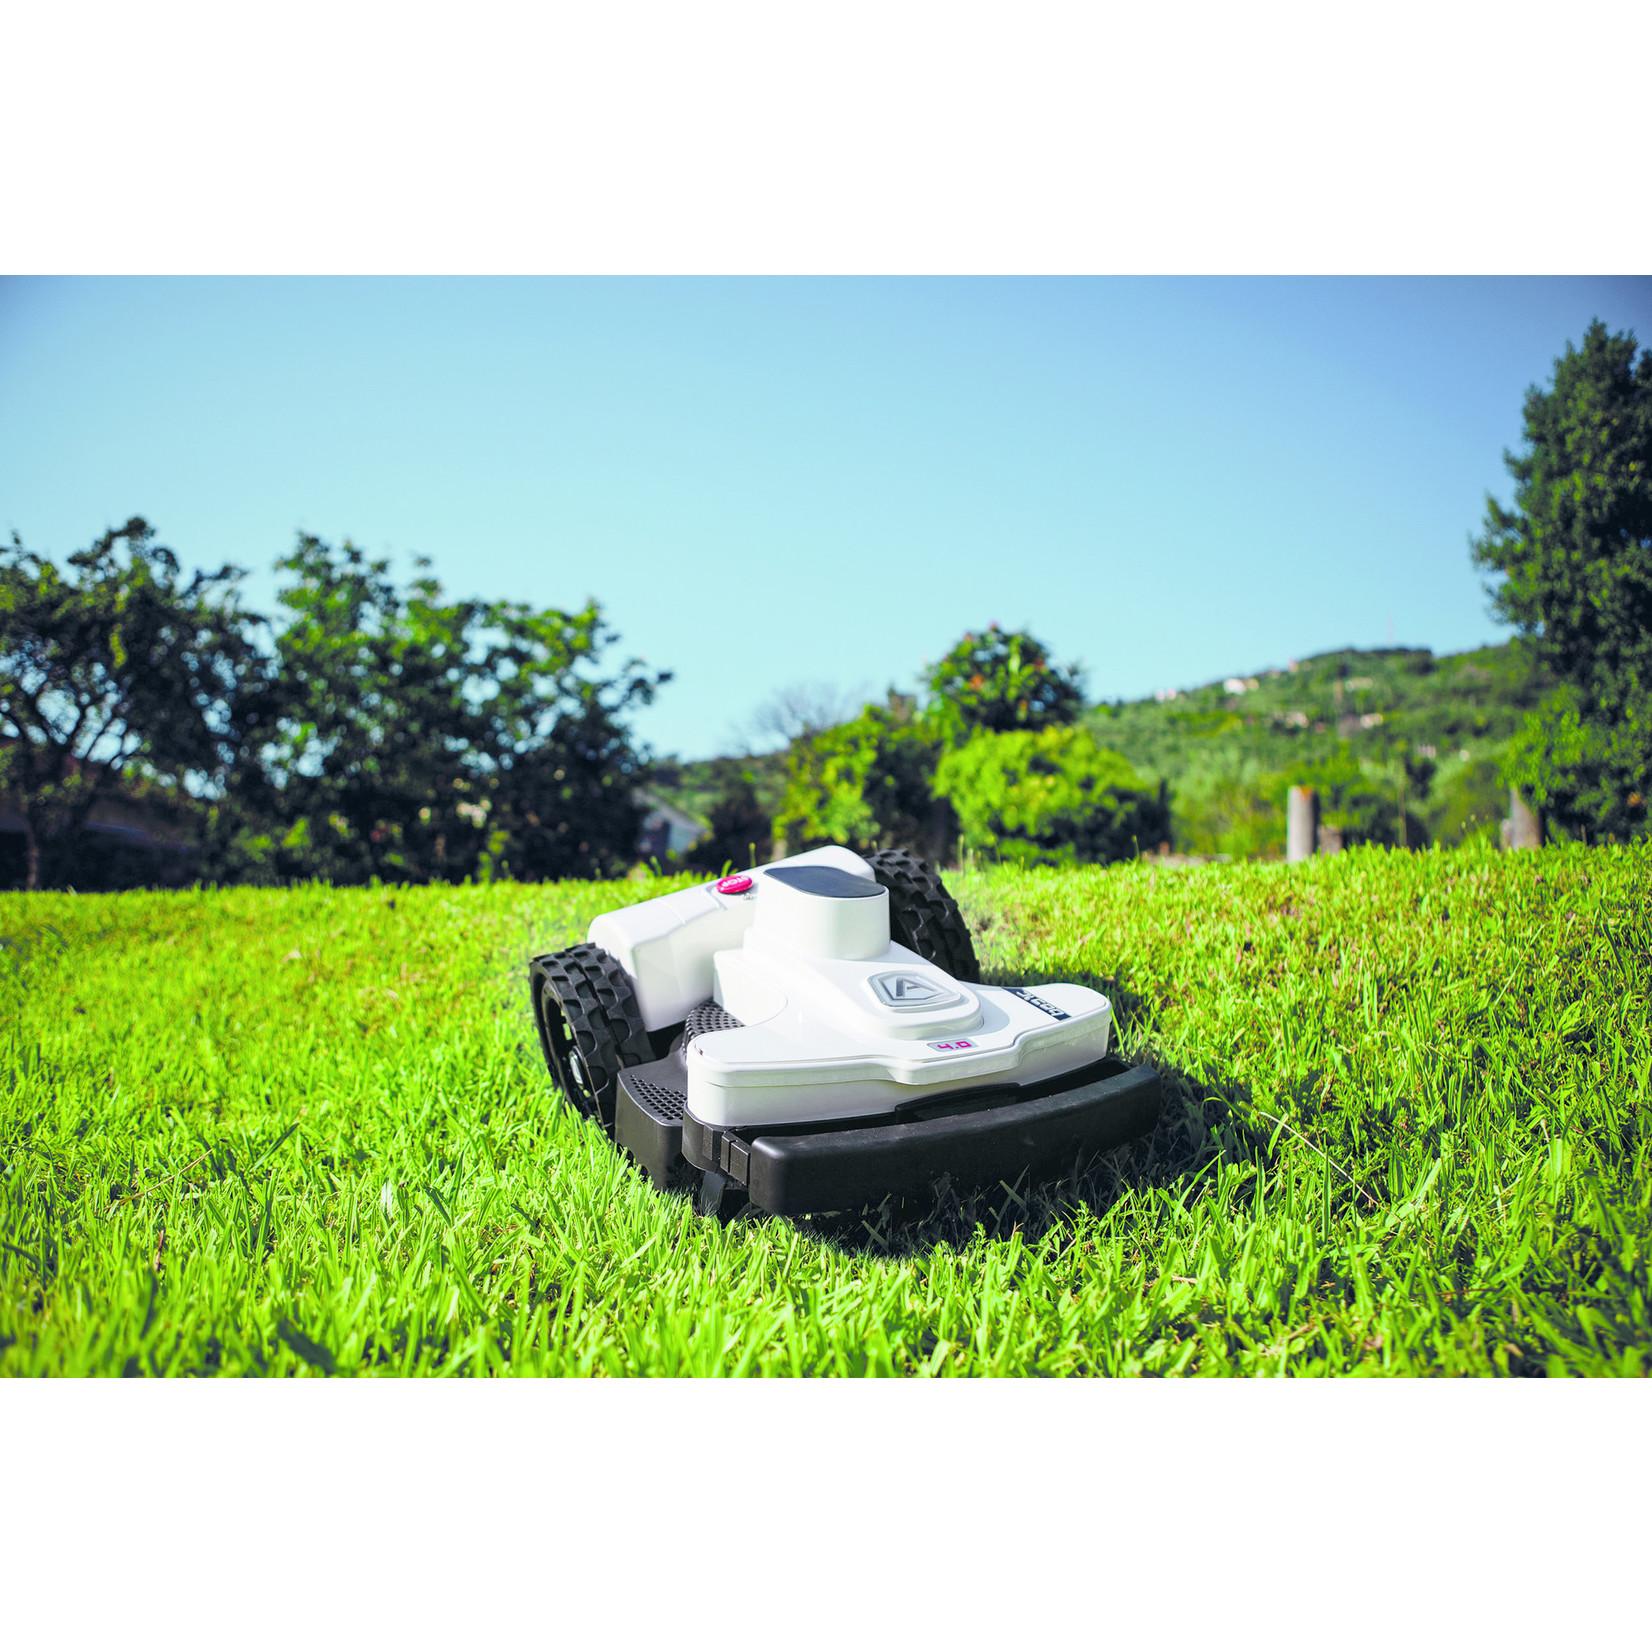 Ambrogio Ambrogio Nextline 4.0 Elite Rasenmähroboter Modell 2021